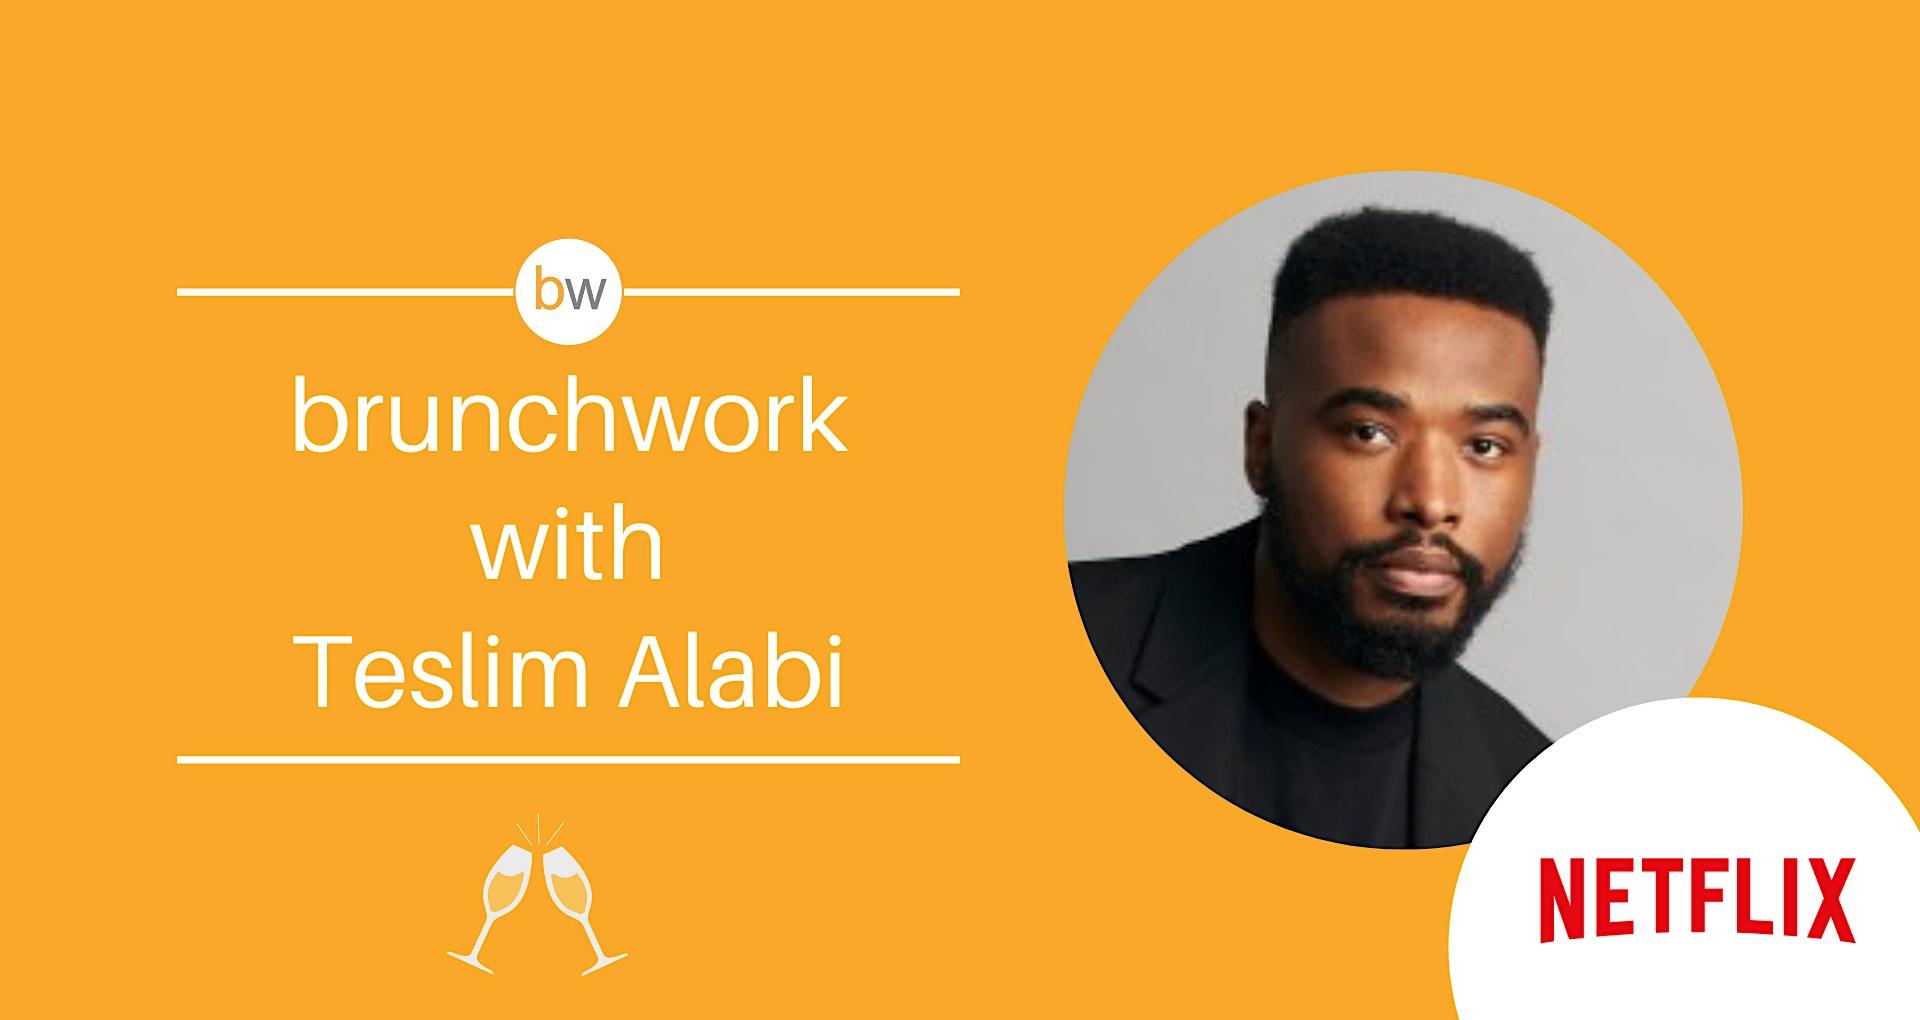 Product Design brunchwork w/ Teslim Alabi (Netflix)